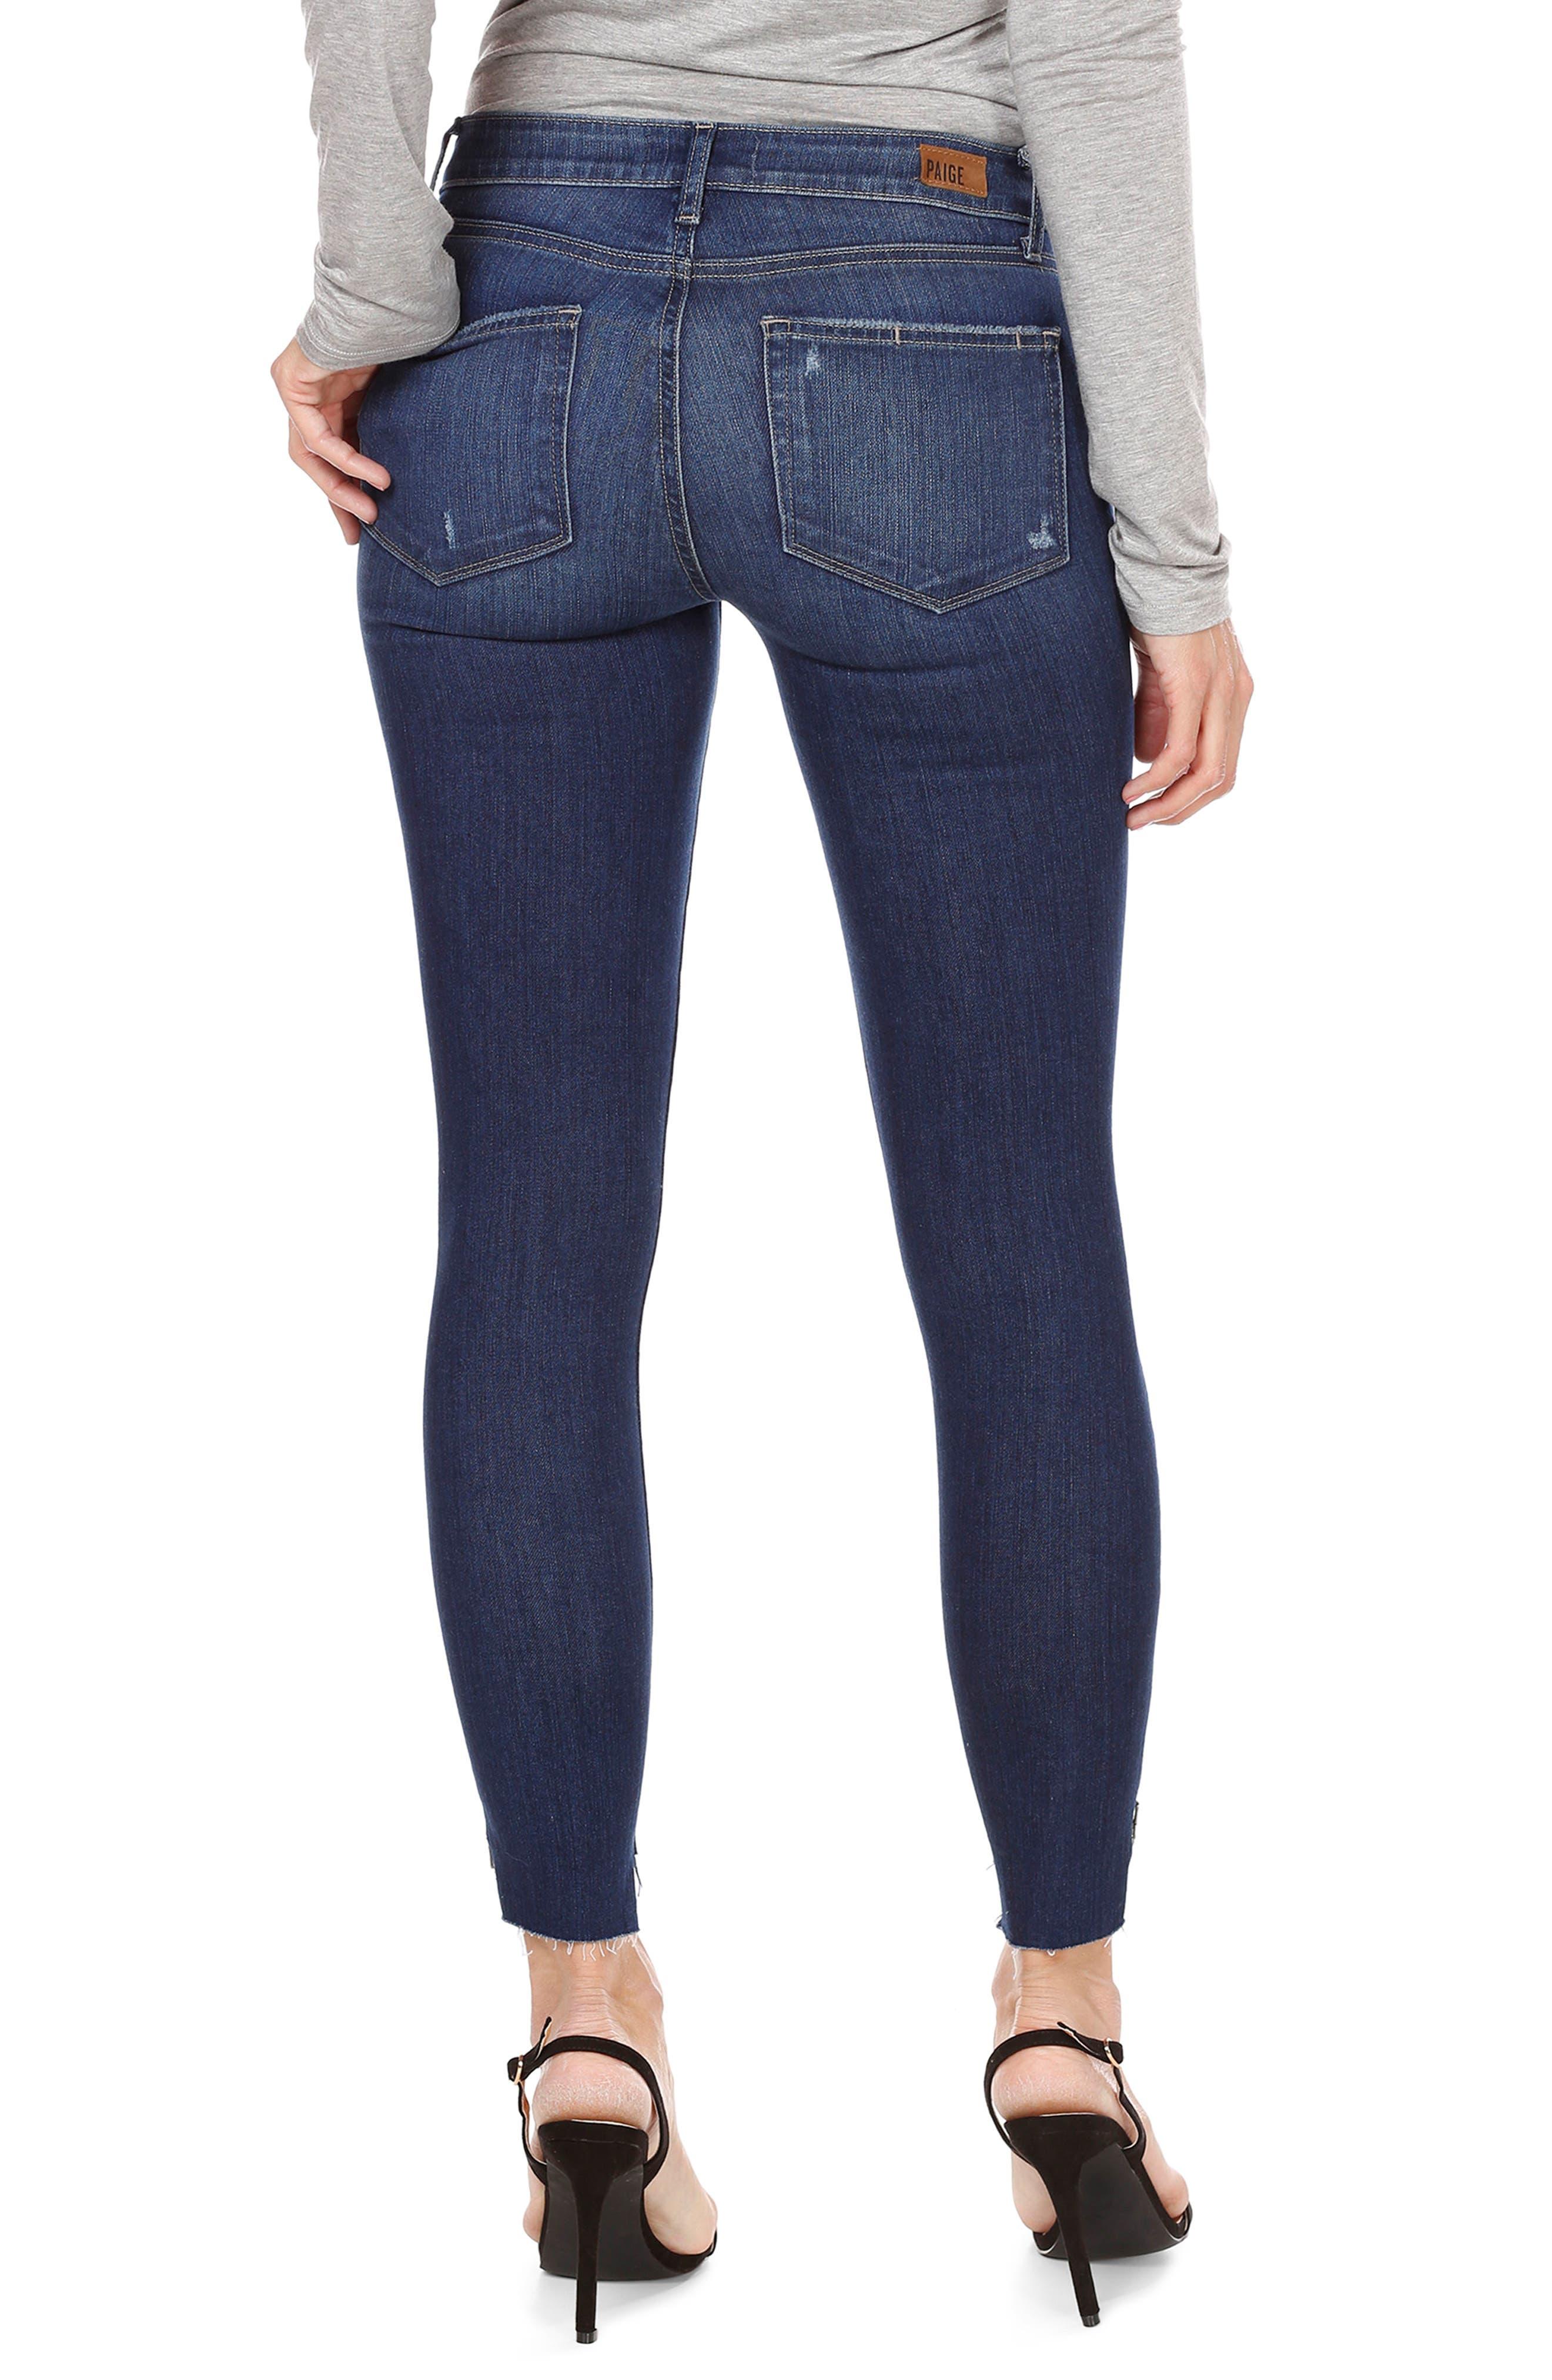 Hoxton High Waist Ankle Skinny Jeans,                             Alternate thumbnail 2, color,                             Marina